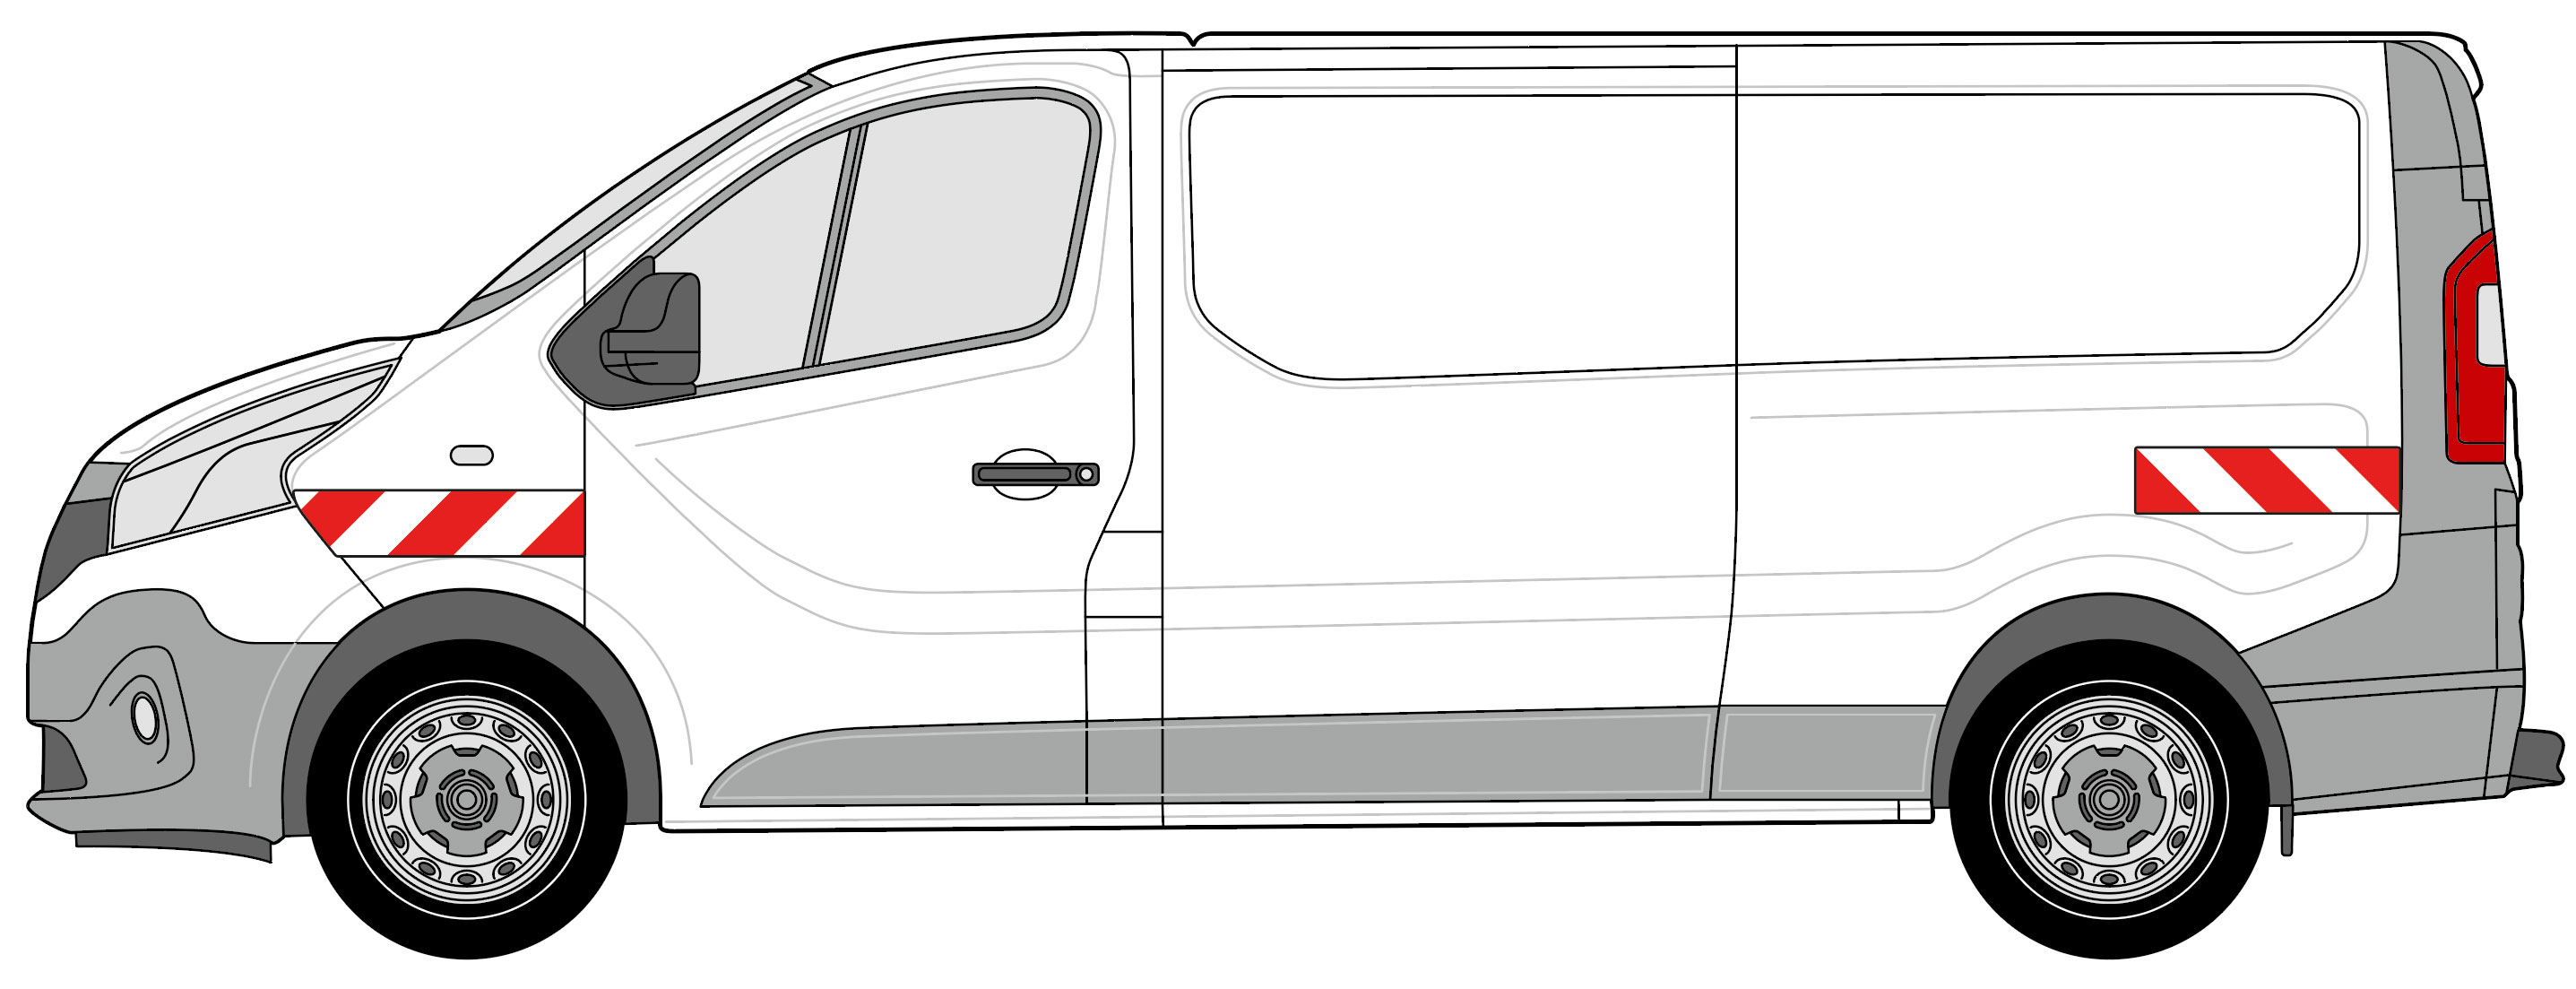 Renault Traffic Heckflügeltüren BJ 2014-2019